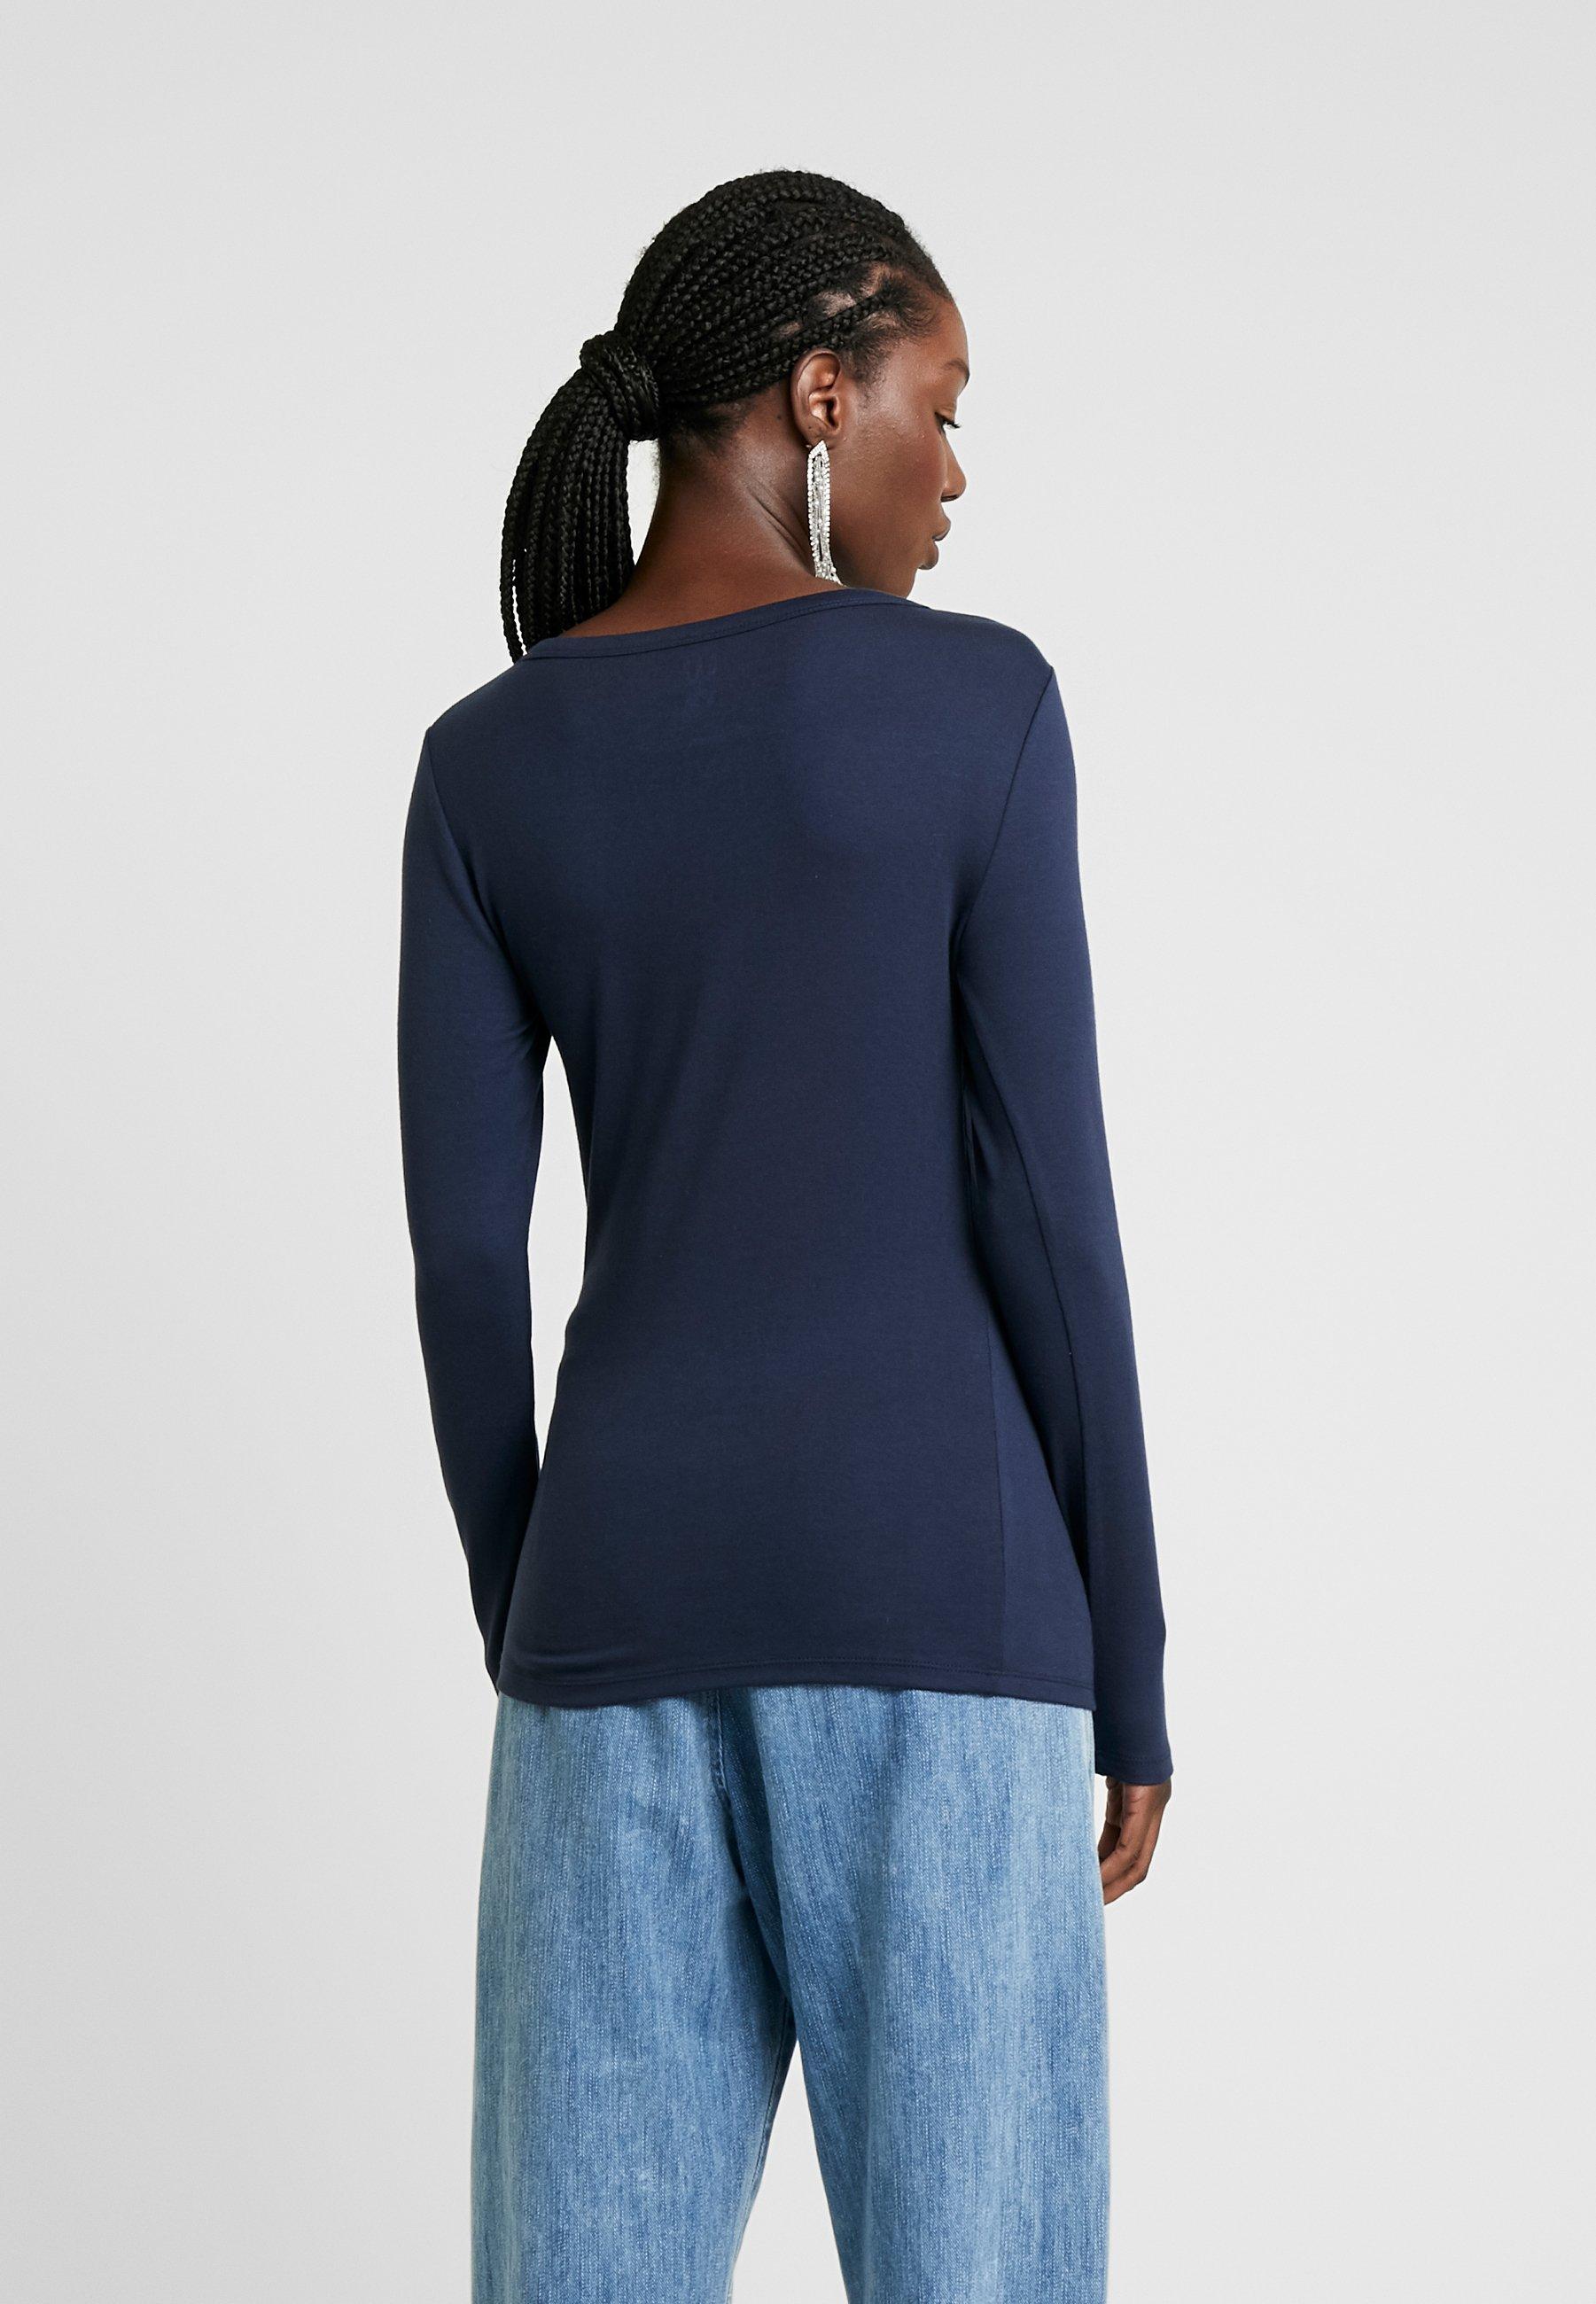 à longues manches shirt GAP true CREWT indigo XOuPiwkZT